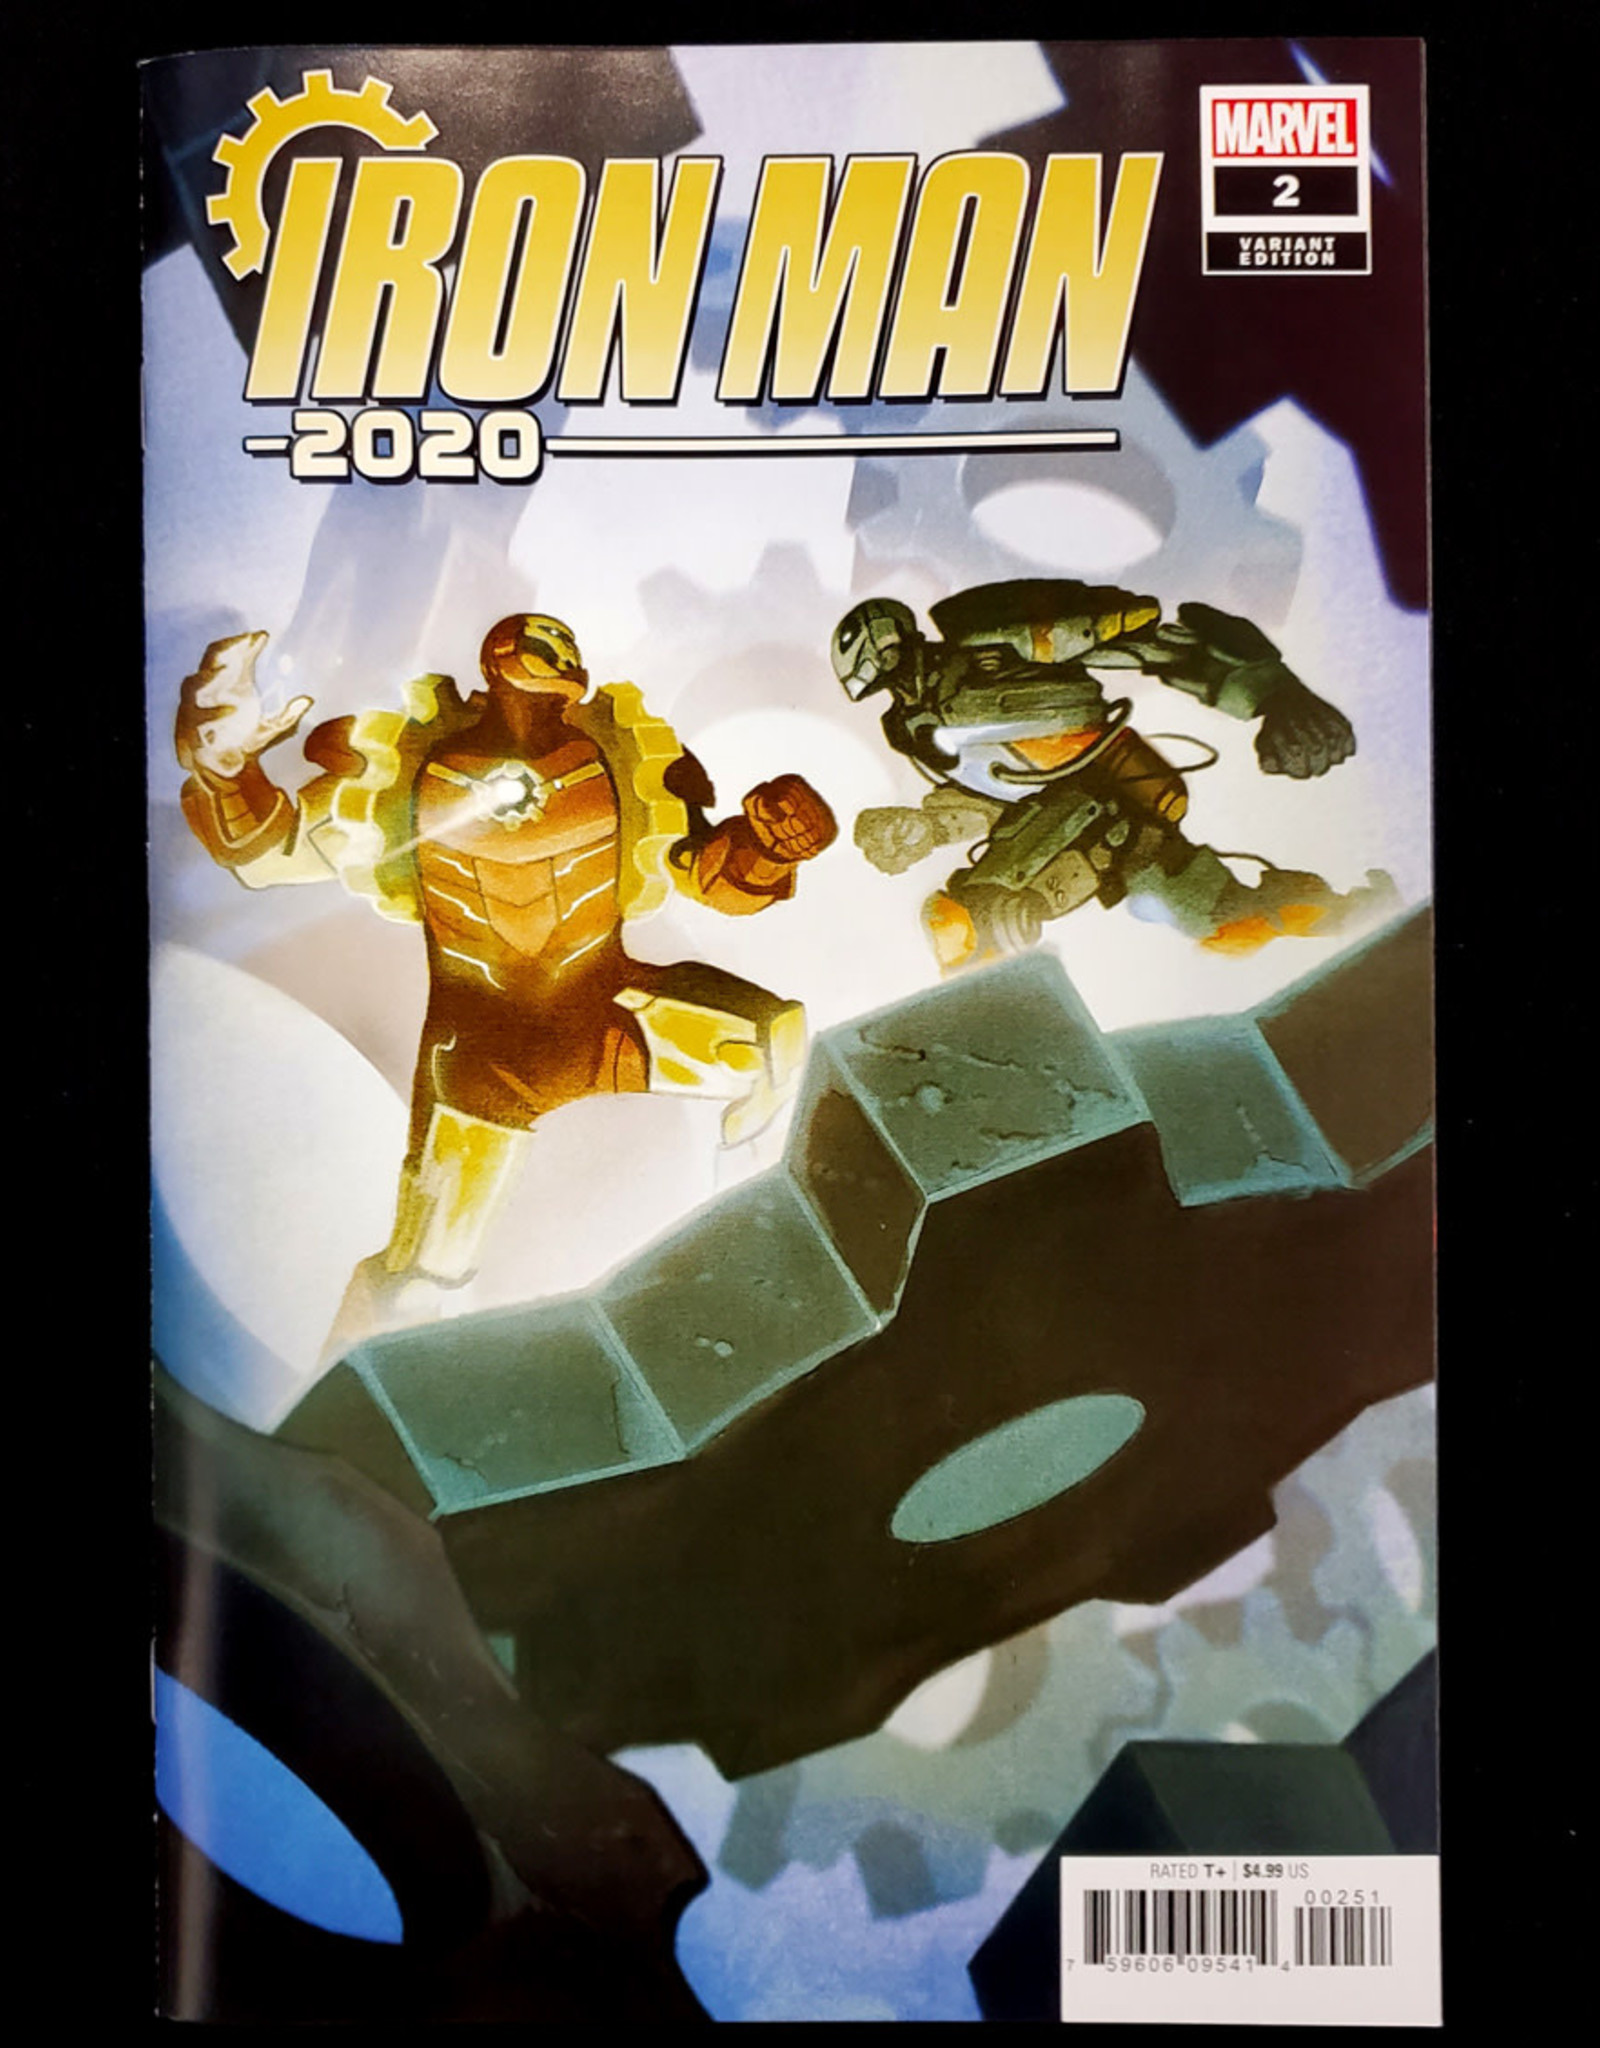 MARVEL COMICS IRON MAN 2020 #2 (OF 6) DEL MUNDO VARIANT